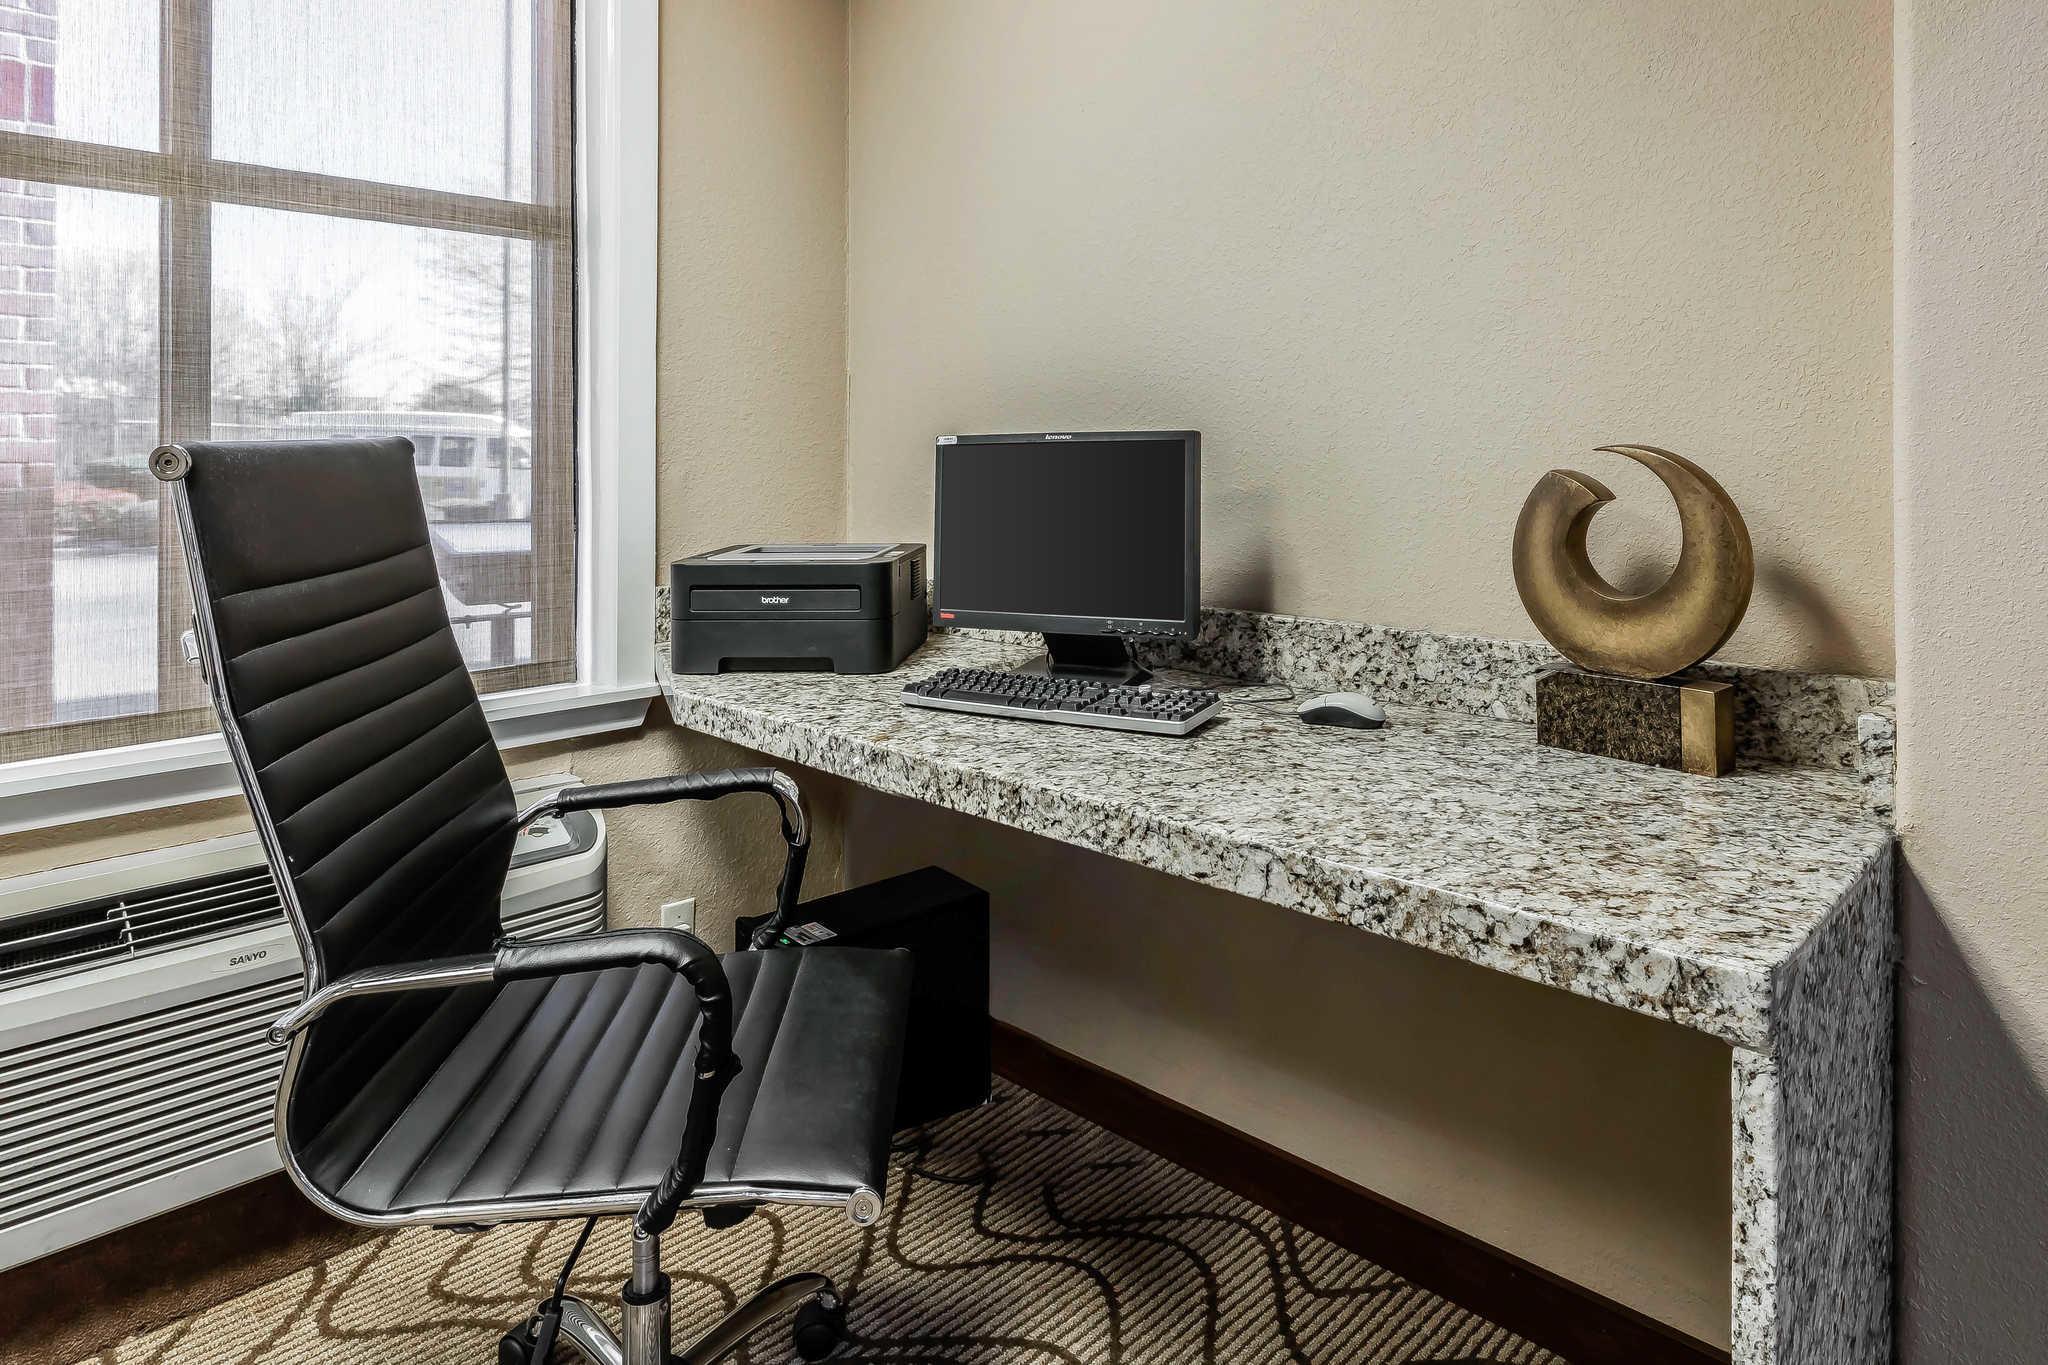 Comfort Inn & Suites Airport-American Way image 29